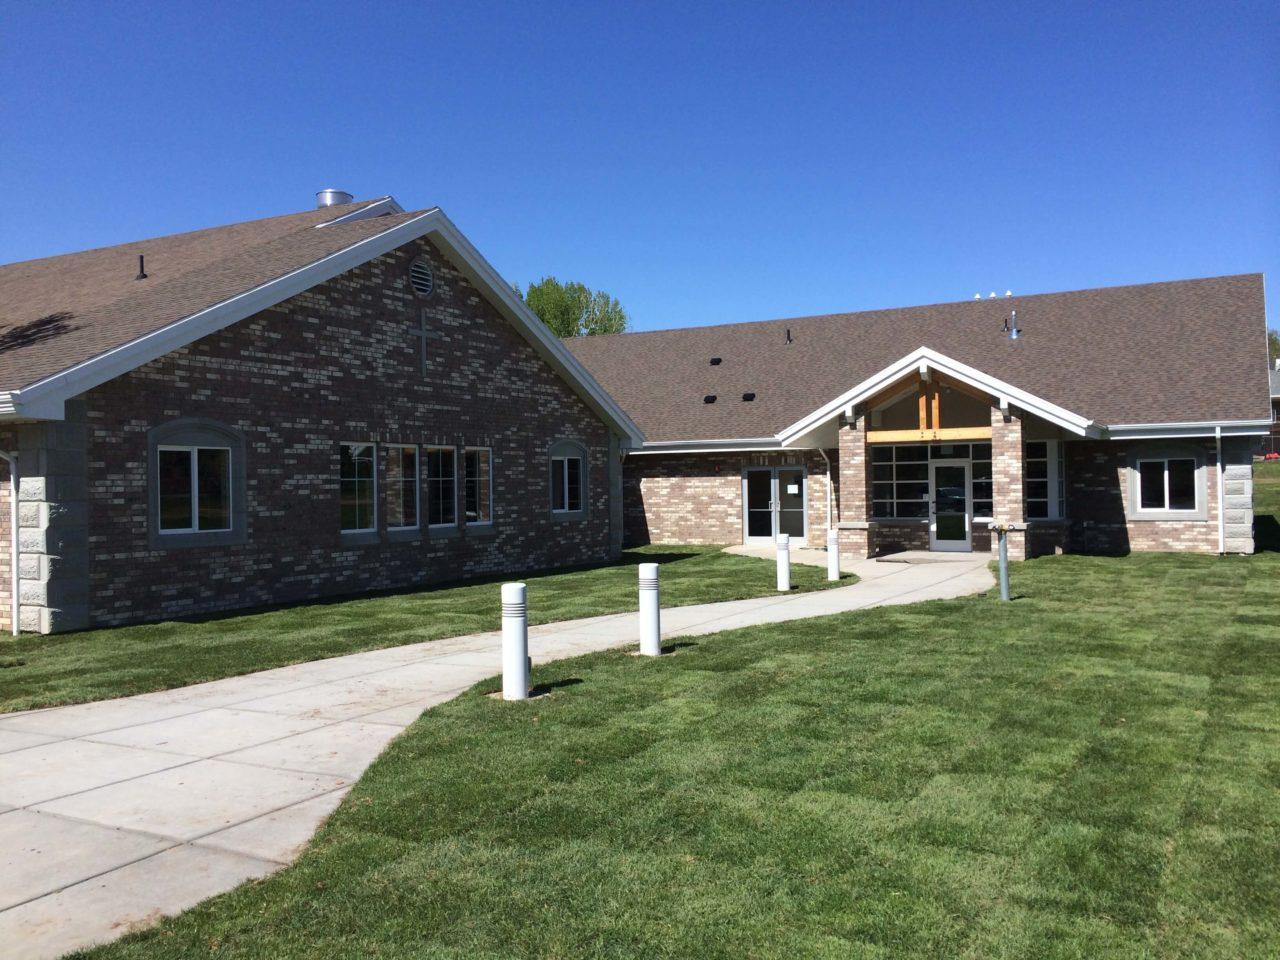 Church Office, Mountain View Baptist Church, Church Renovation, Mountain West Architects, Layton Church